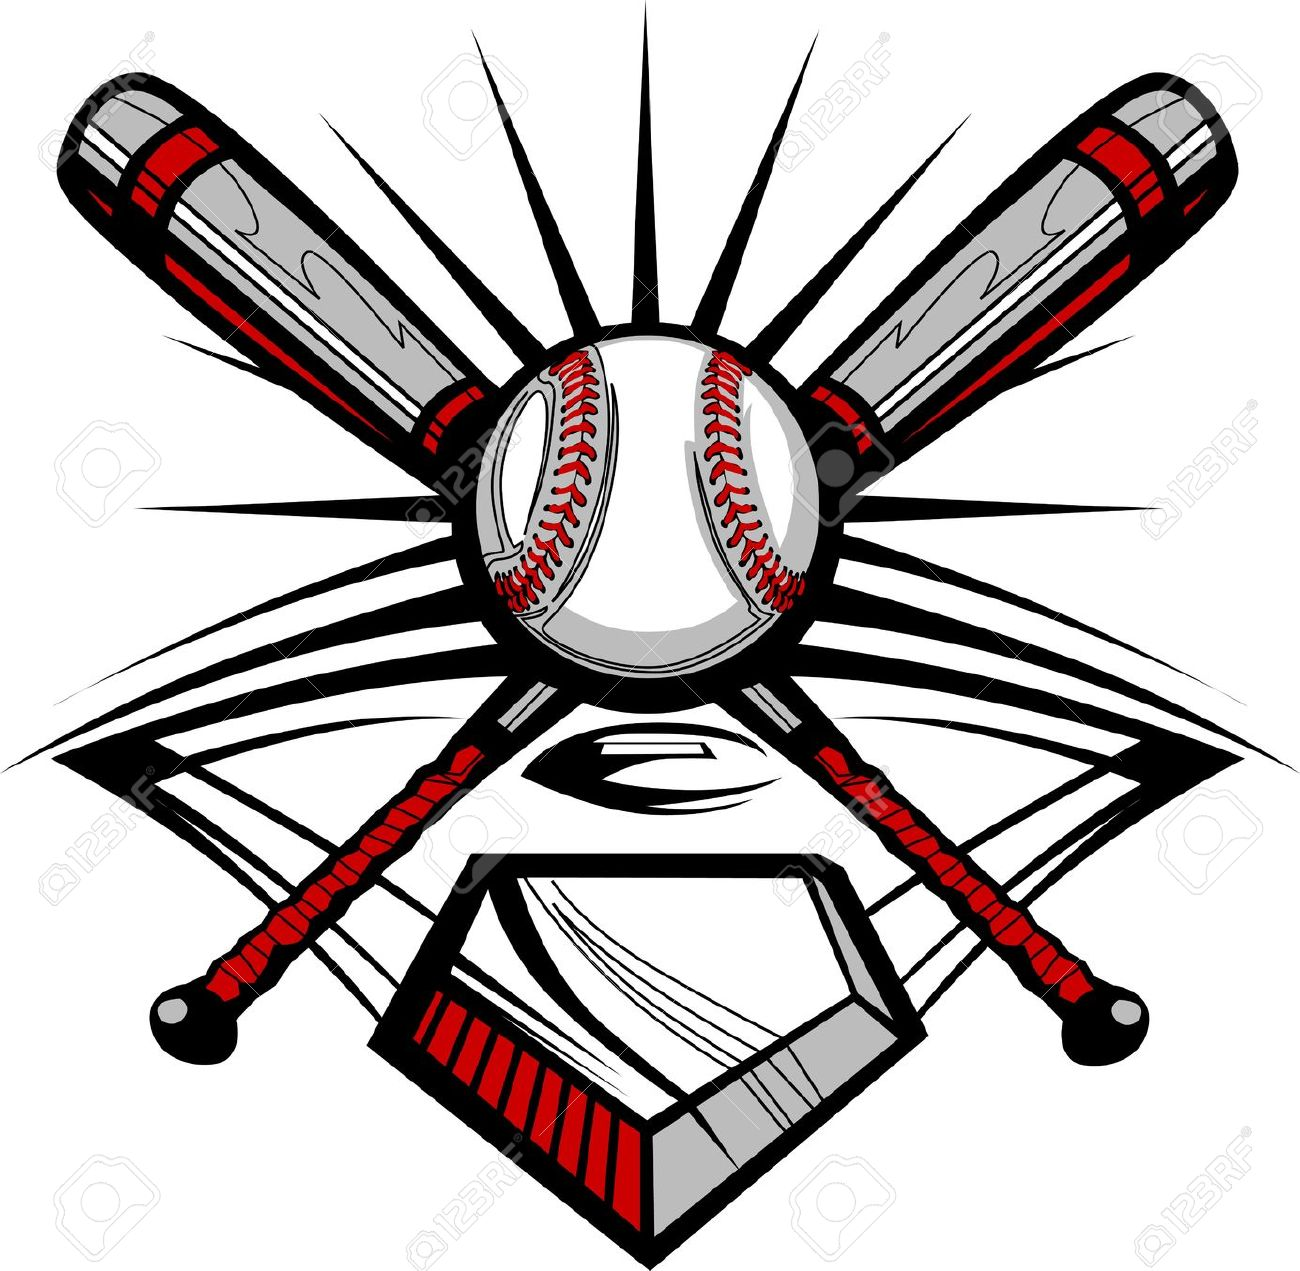 1300x1271 Baseball Bat Clipart Softball Tournament Free Collection